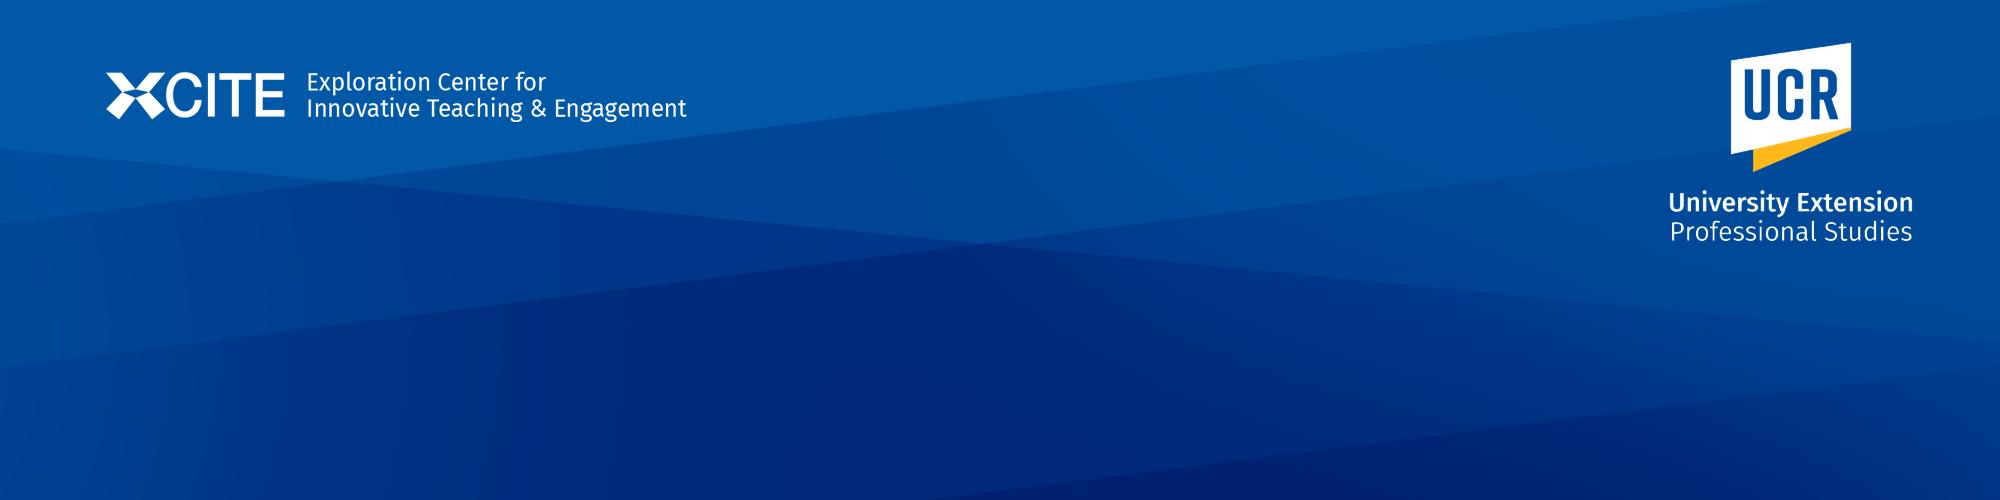 https://res.cloudinary.com/accelevents/image/fetch/c_fill,dpr_1.0,f_auto,fl_lossy,h_500,q_100,w_2000/https://s3.amazonaws.com/v2-s3-prod-accelevents/21f0ce63-2ea7-4ee1-a9c3-d5f5a5eb90e5